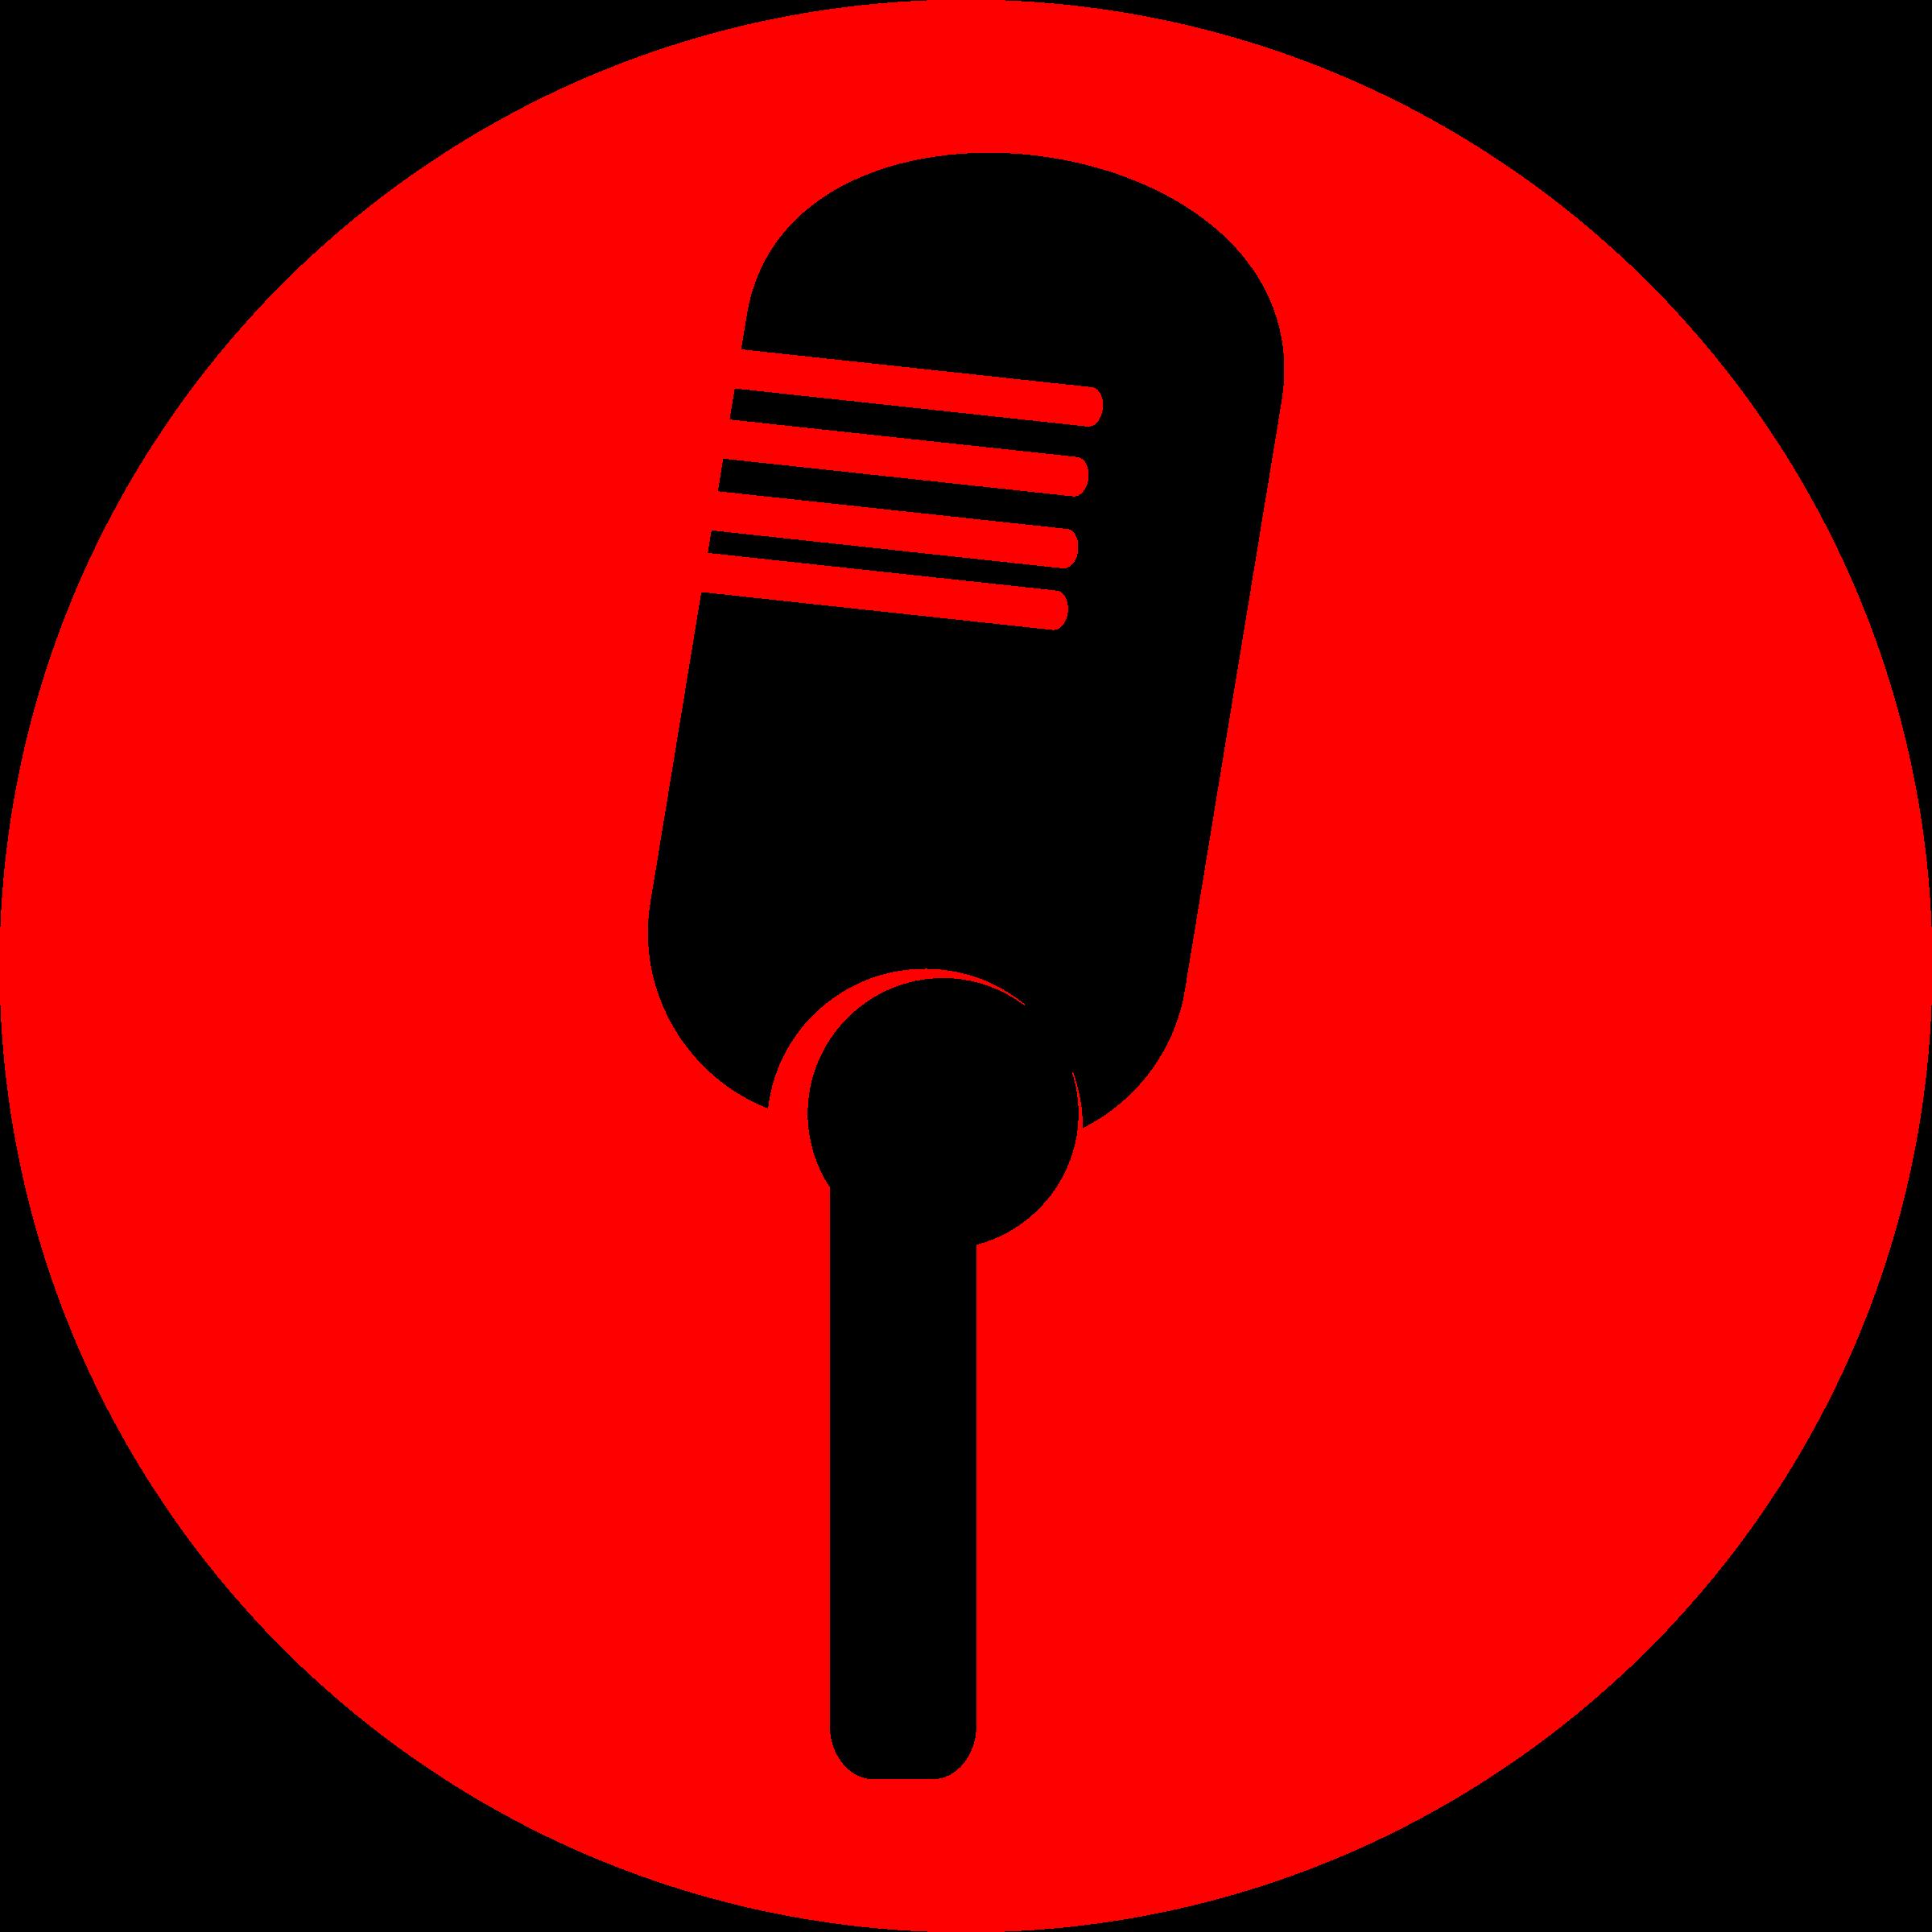 Microphone clipart podium. Cao lanh bridge on